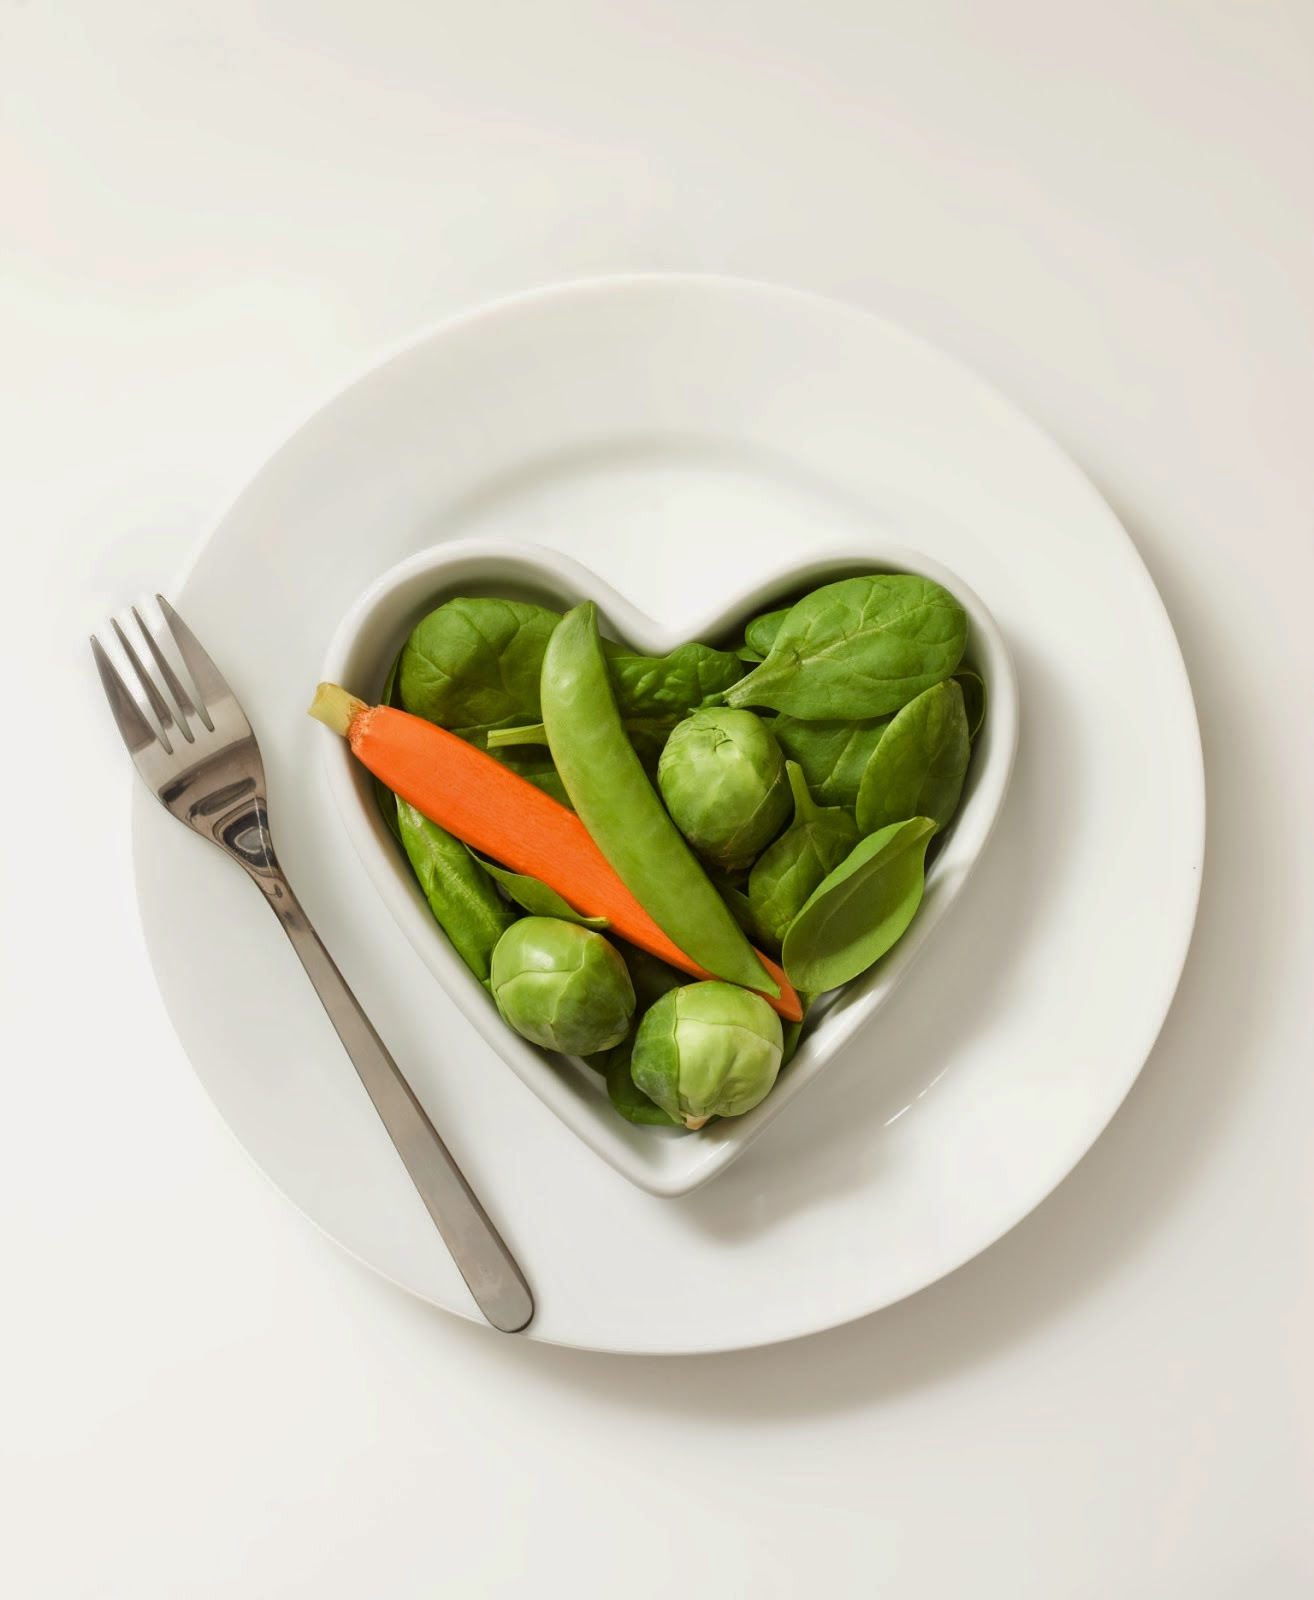 Daftar Makanan untuk Meringankan Osteoarthritis Lutut